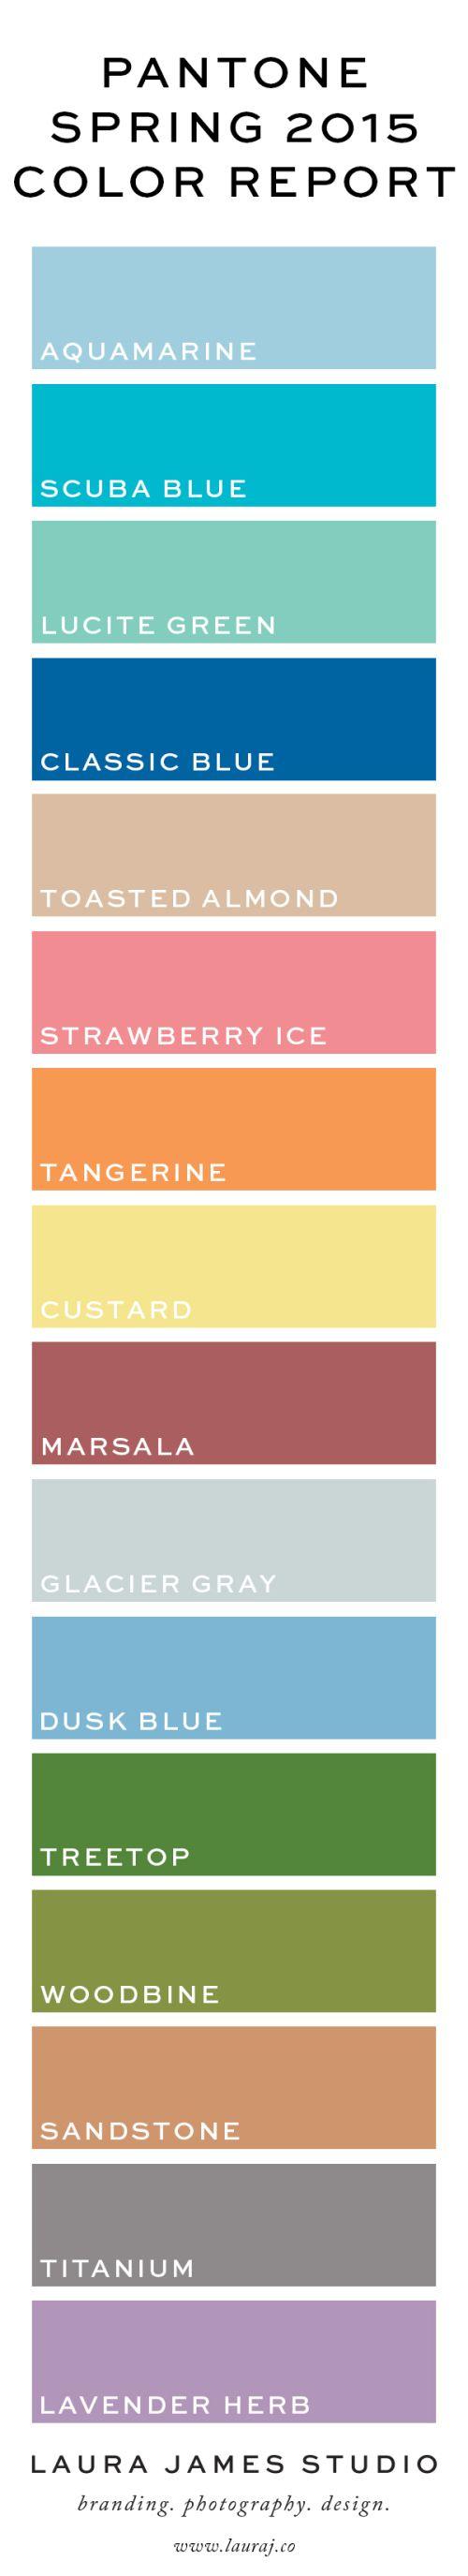 laura-james-studio-pantone-2015-color-report-tiles-chips-aquamarine-scuba-blue-lucite-green-classic-toasted-almond-strawberry-ice-tangerine-custard-marsala-glacier-gray-dusk-treetop-woodbine-sandstone-titanium-lavender-herb-graphic-design